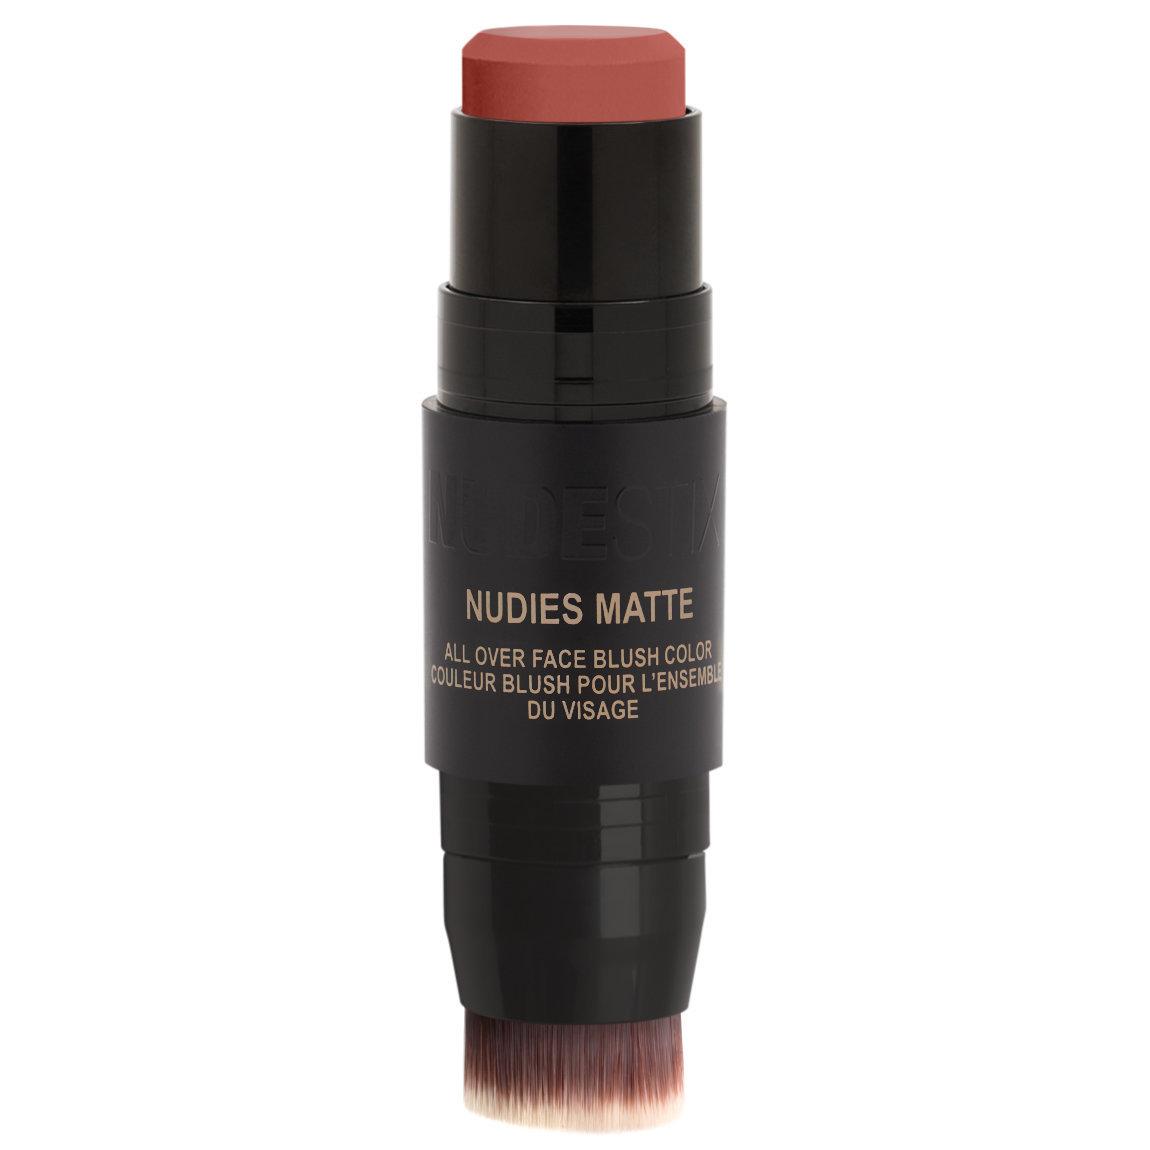 Nudestix Nudies Matte Blush & Bronze Cherie alternative view 1.